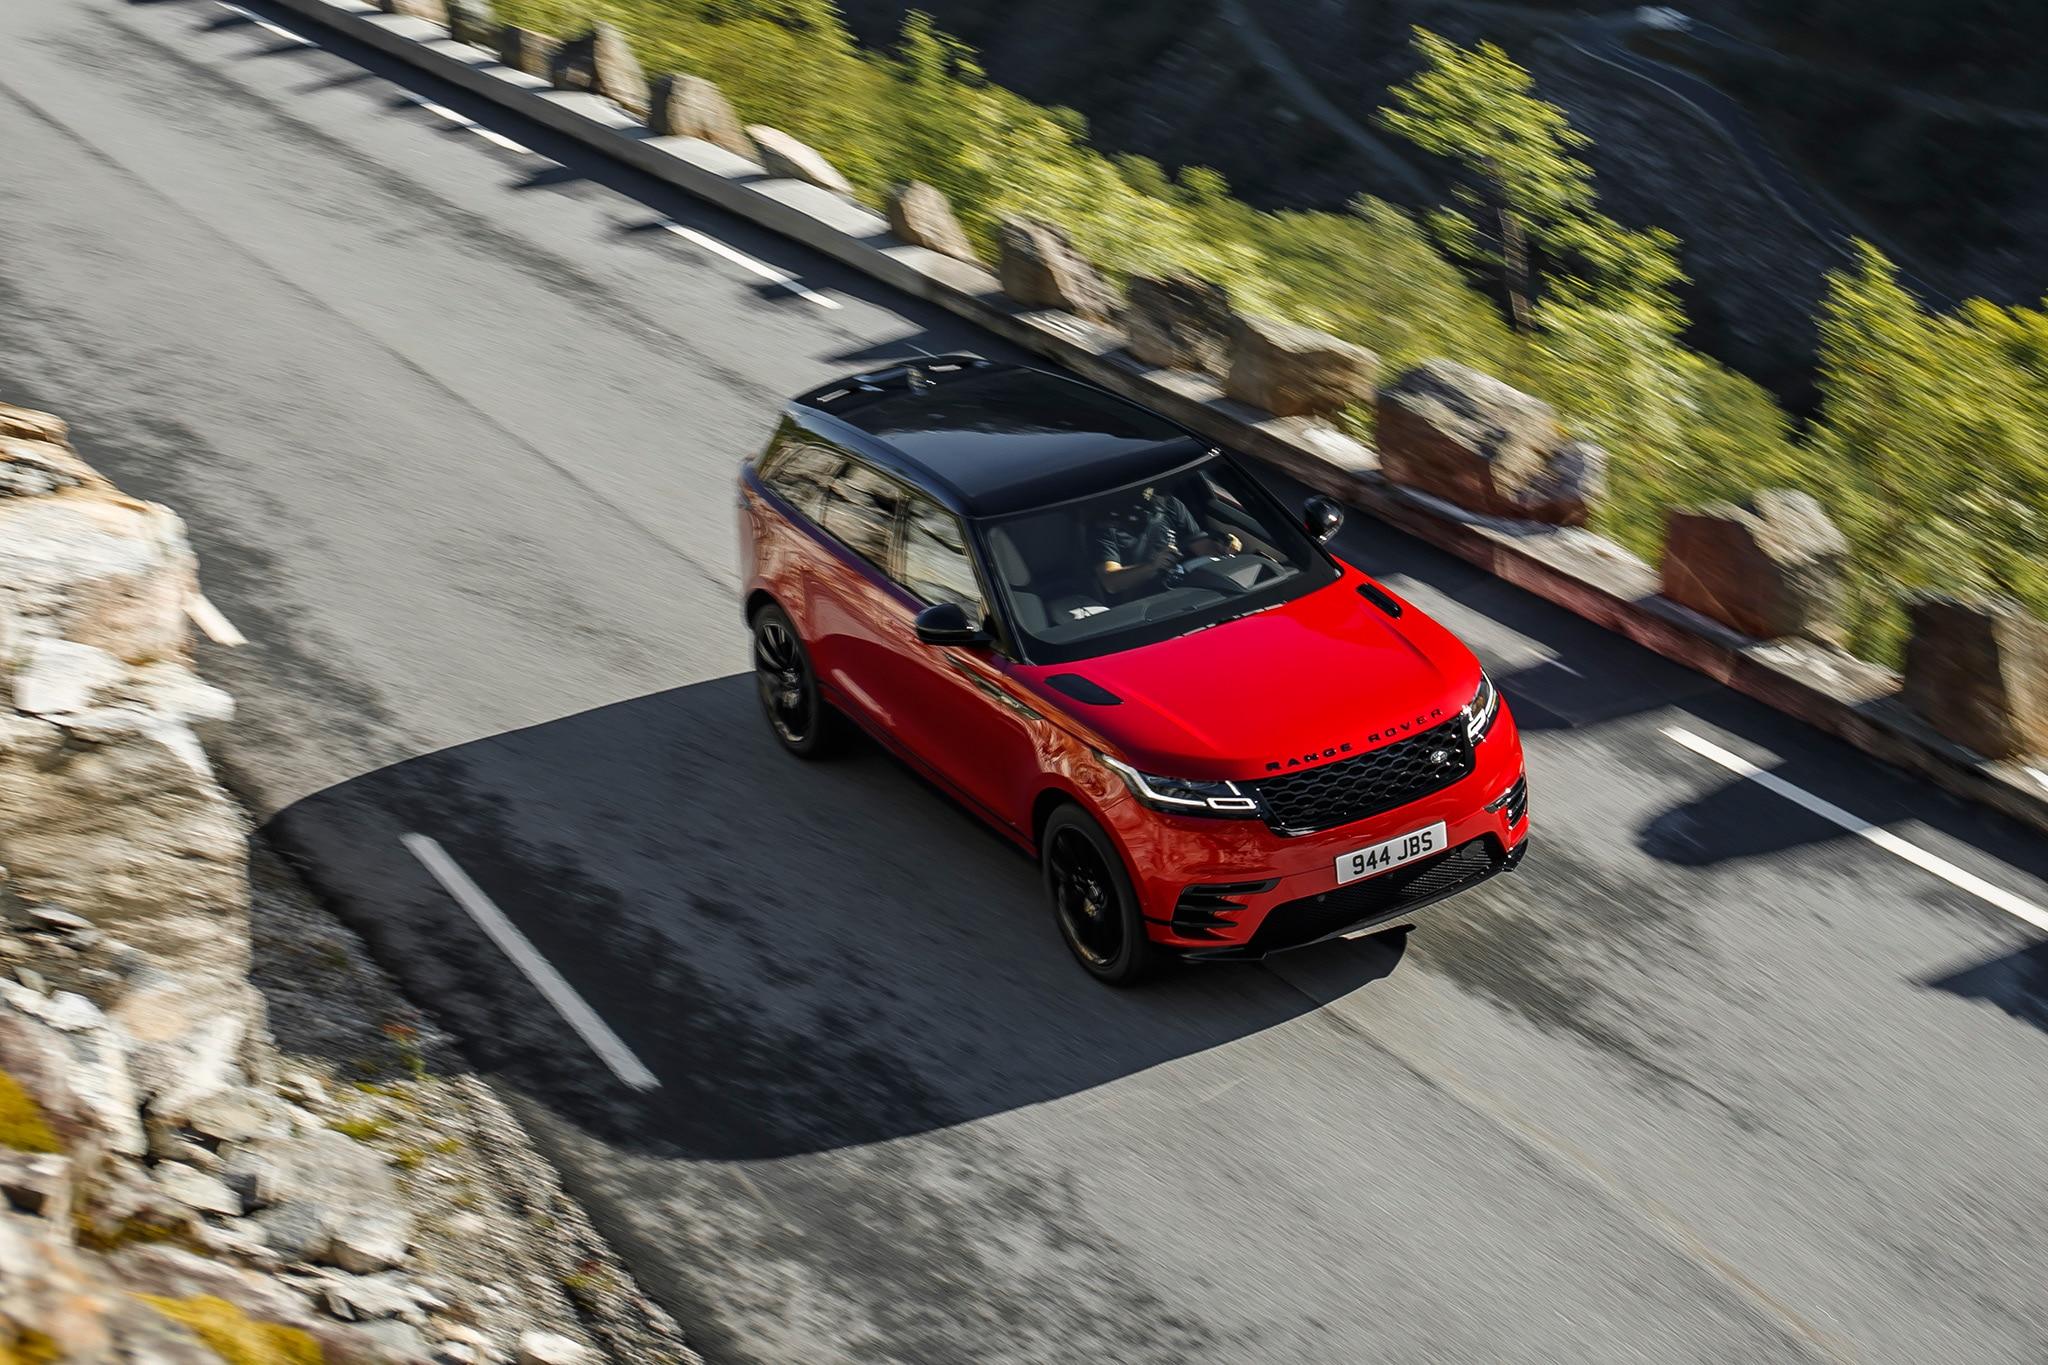 Range Rover Velar First Drive Review Automobile Magazine - Us zip code range